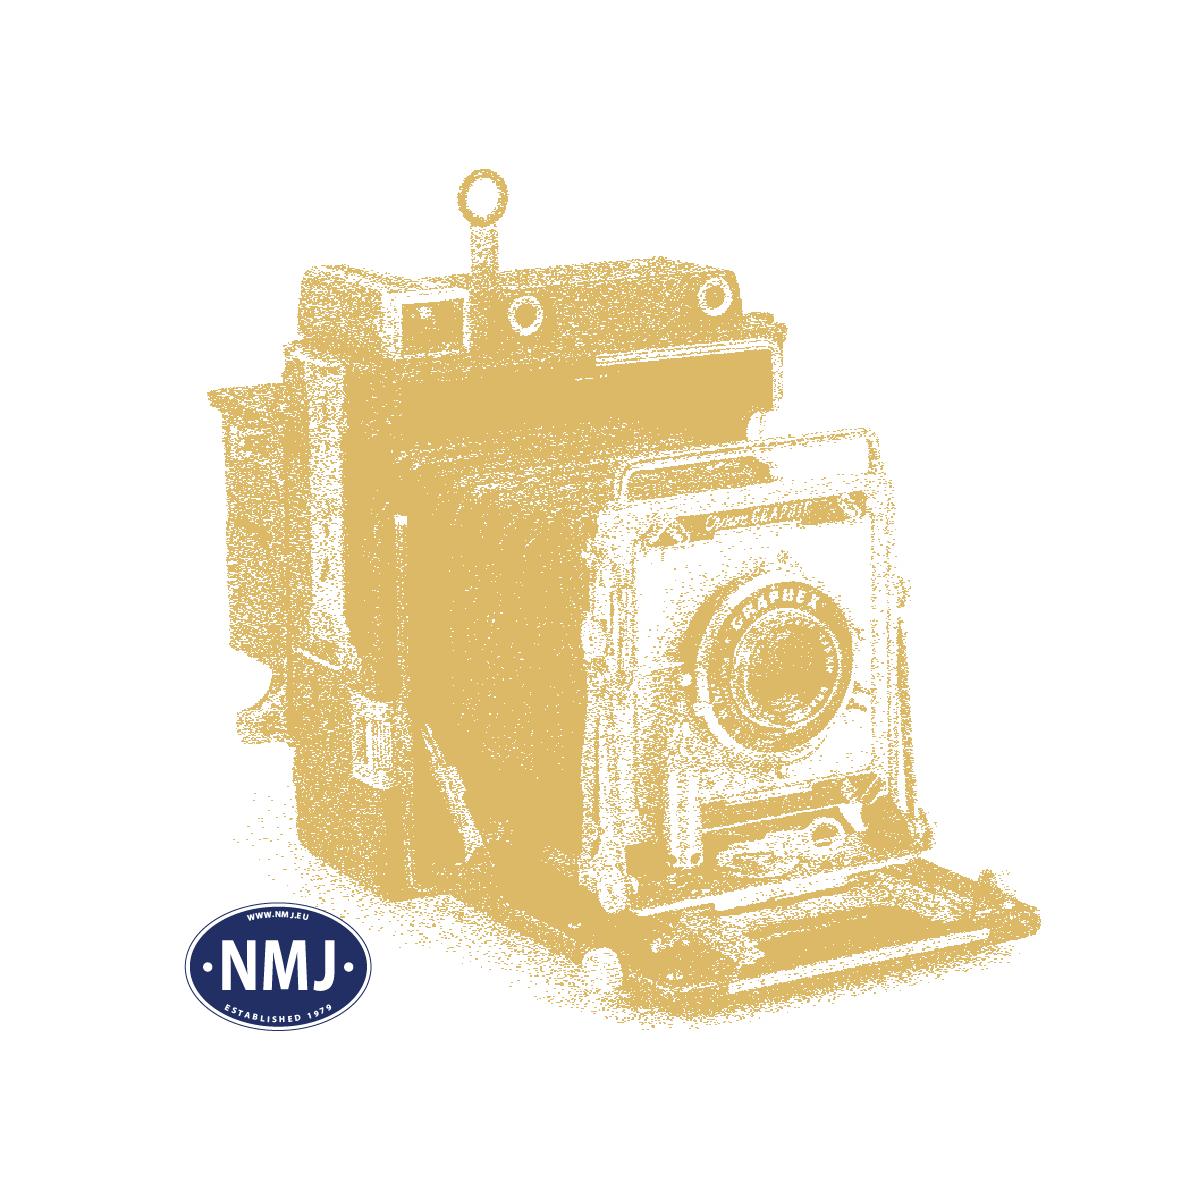 NMJT604.509 - NMJ Topline SJ G 50233, ASG, Yellow